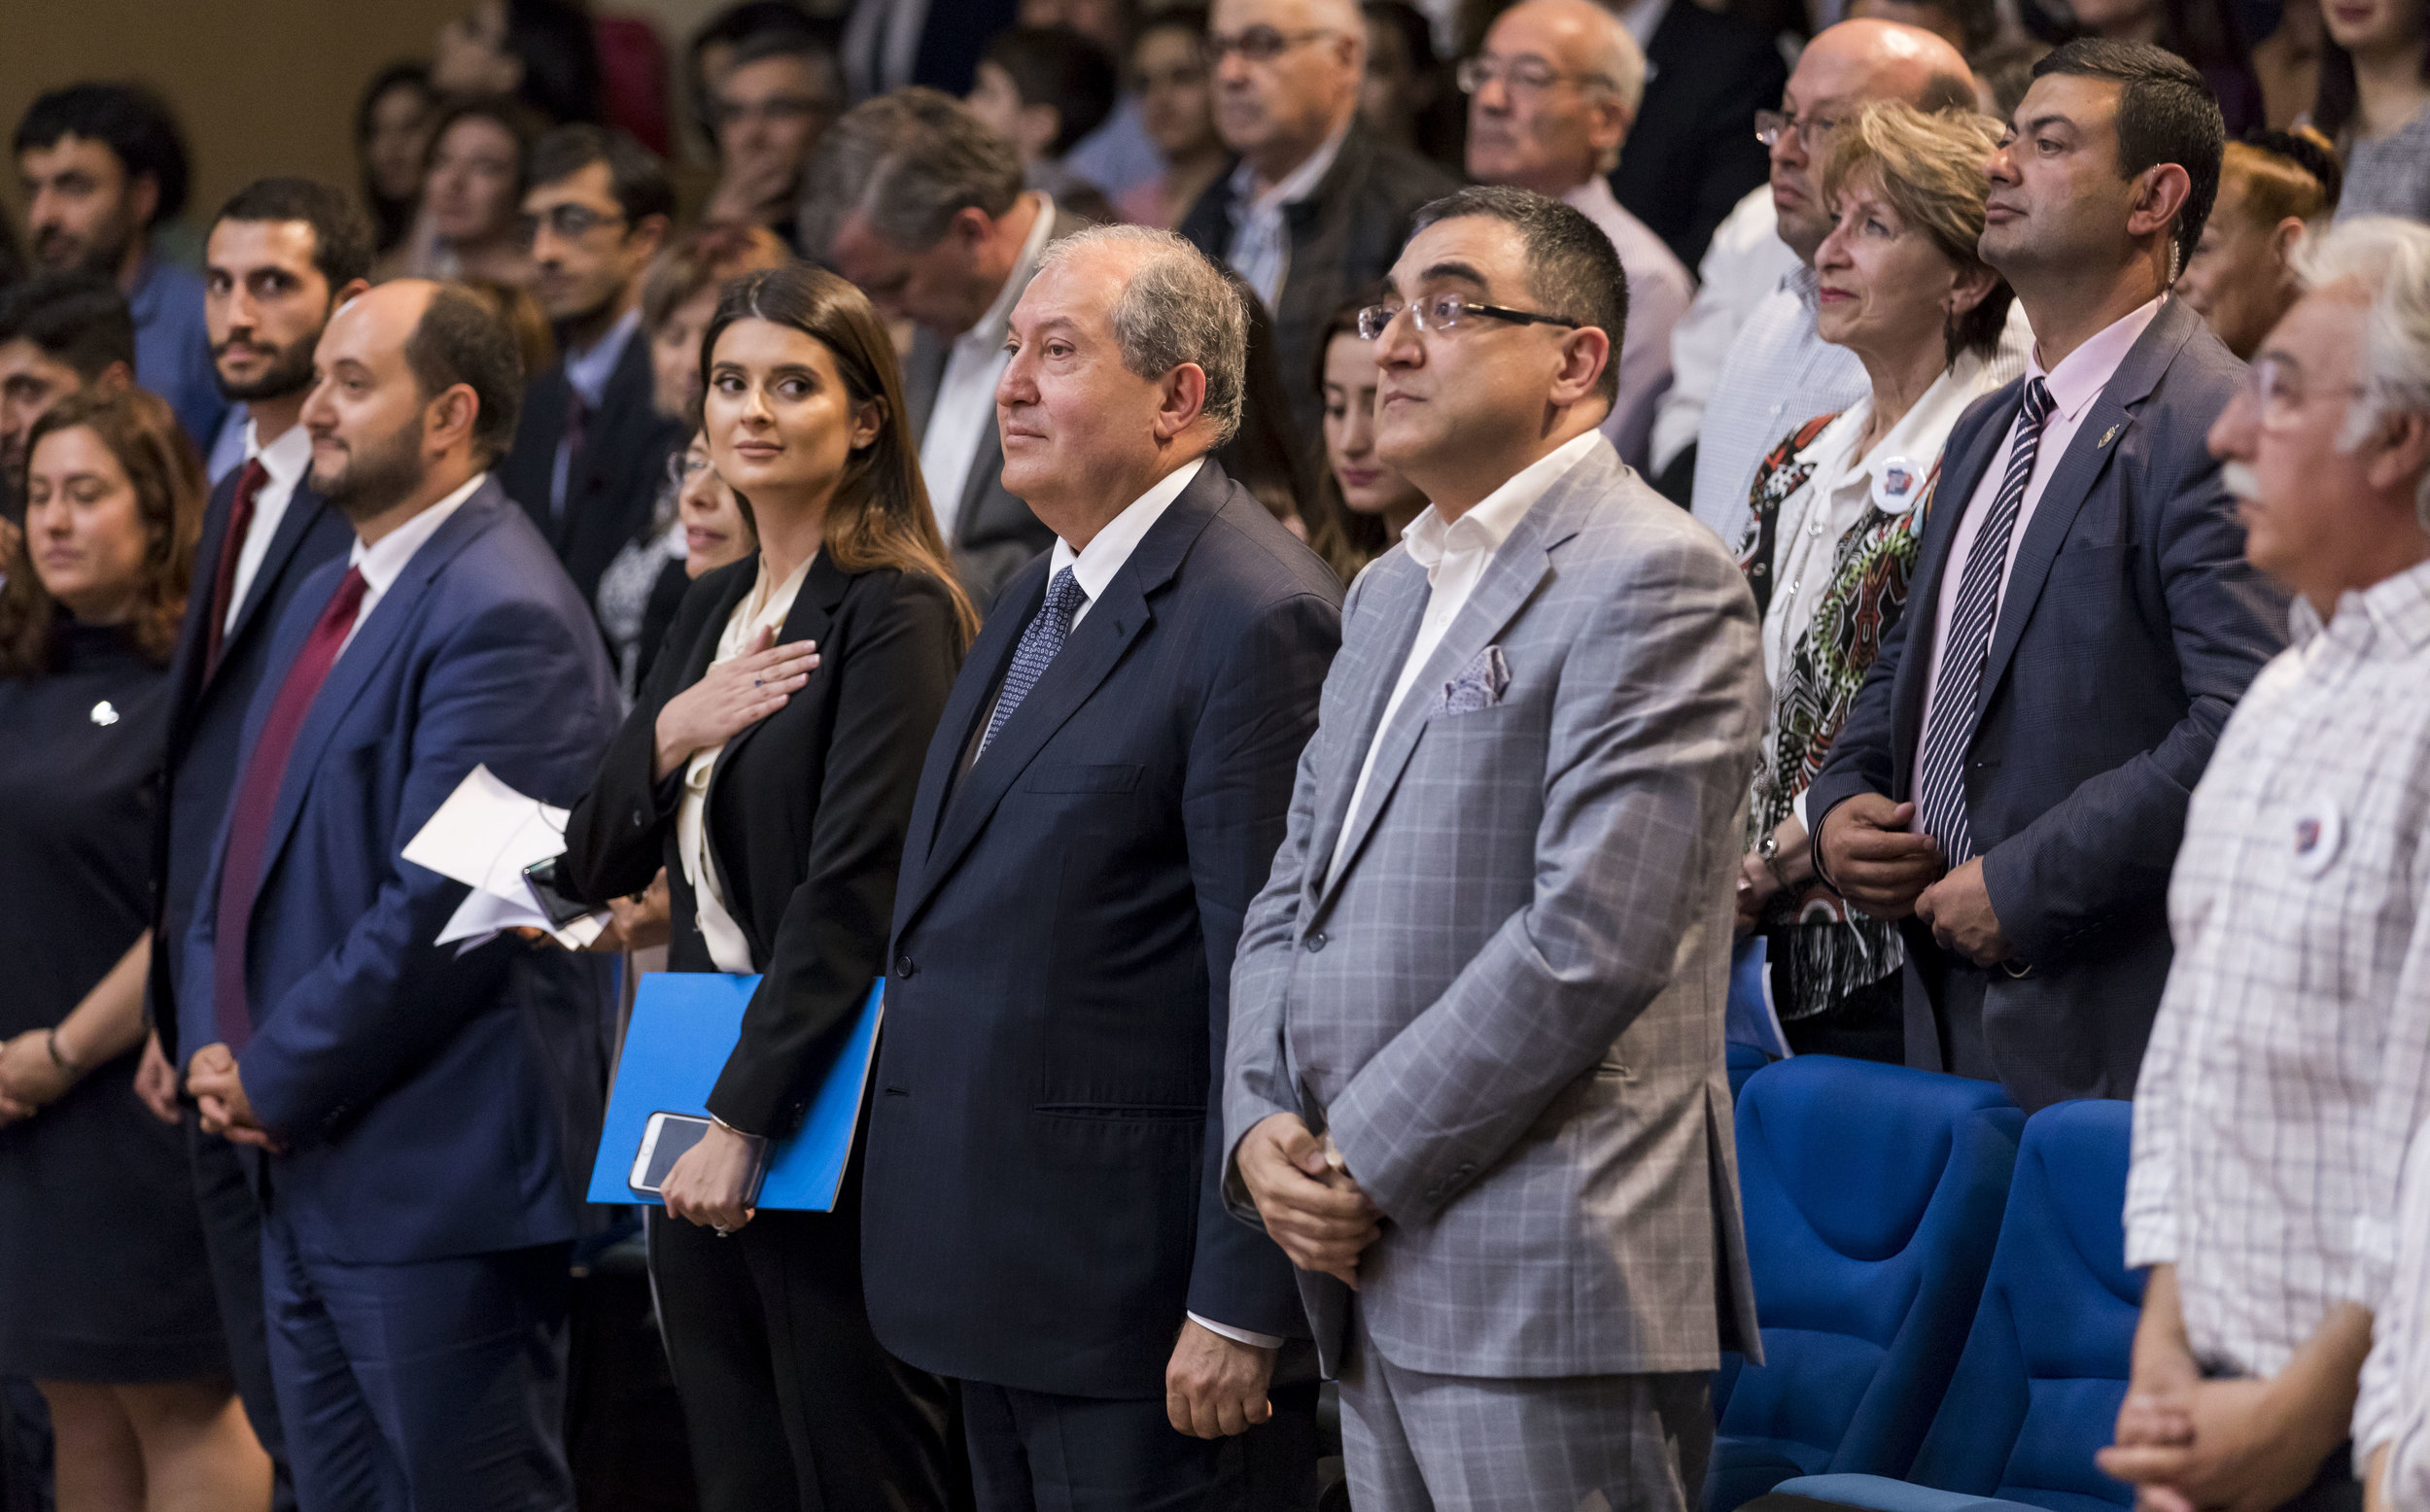 Ambassador Induction Ceremony 2018